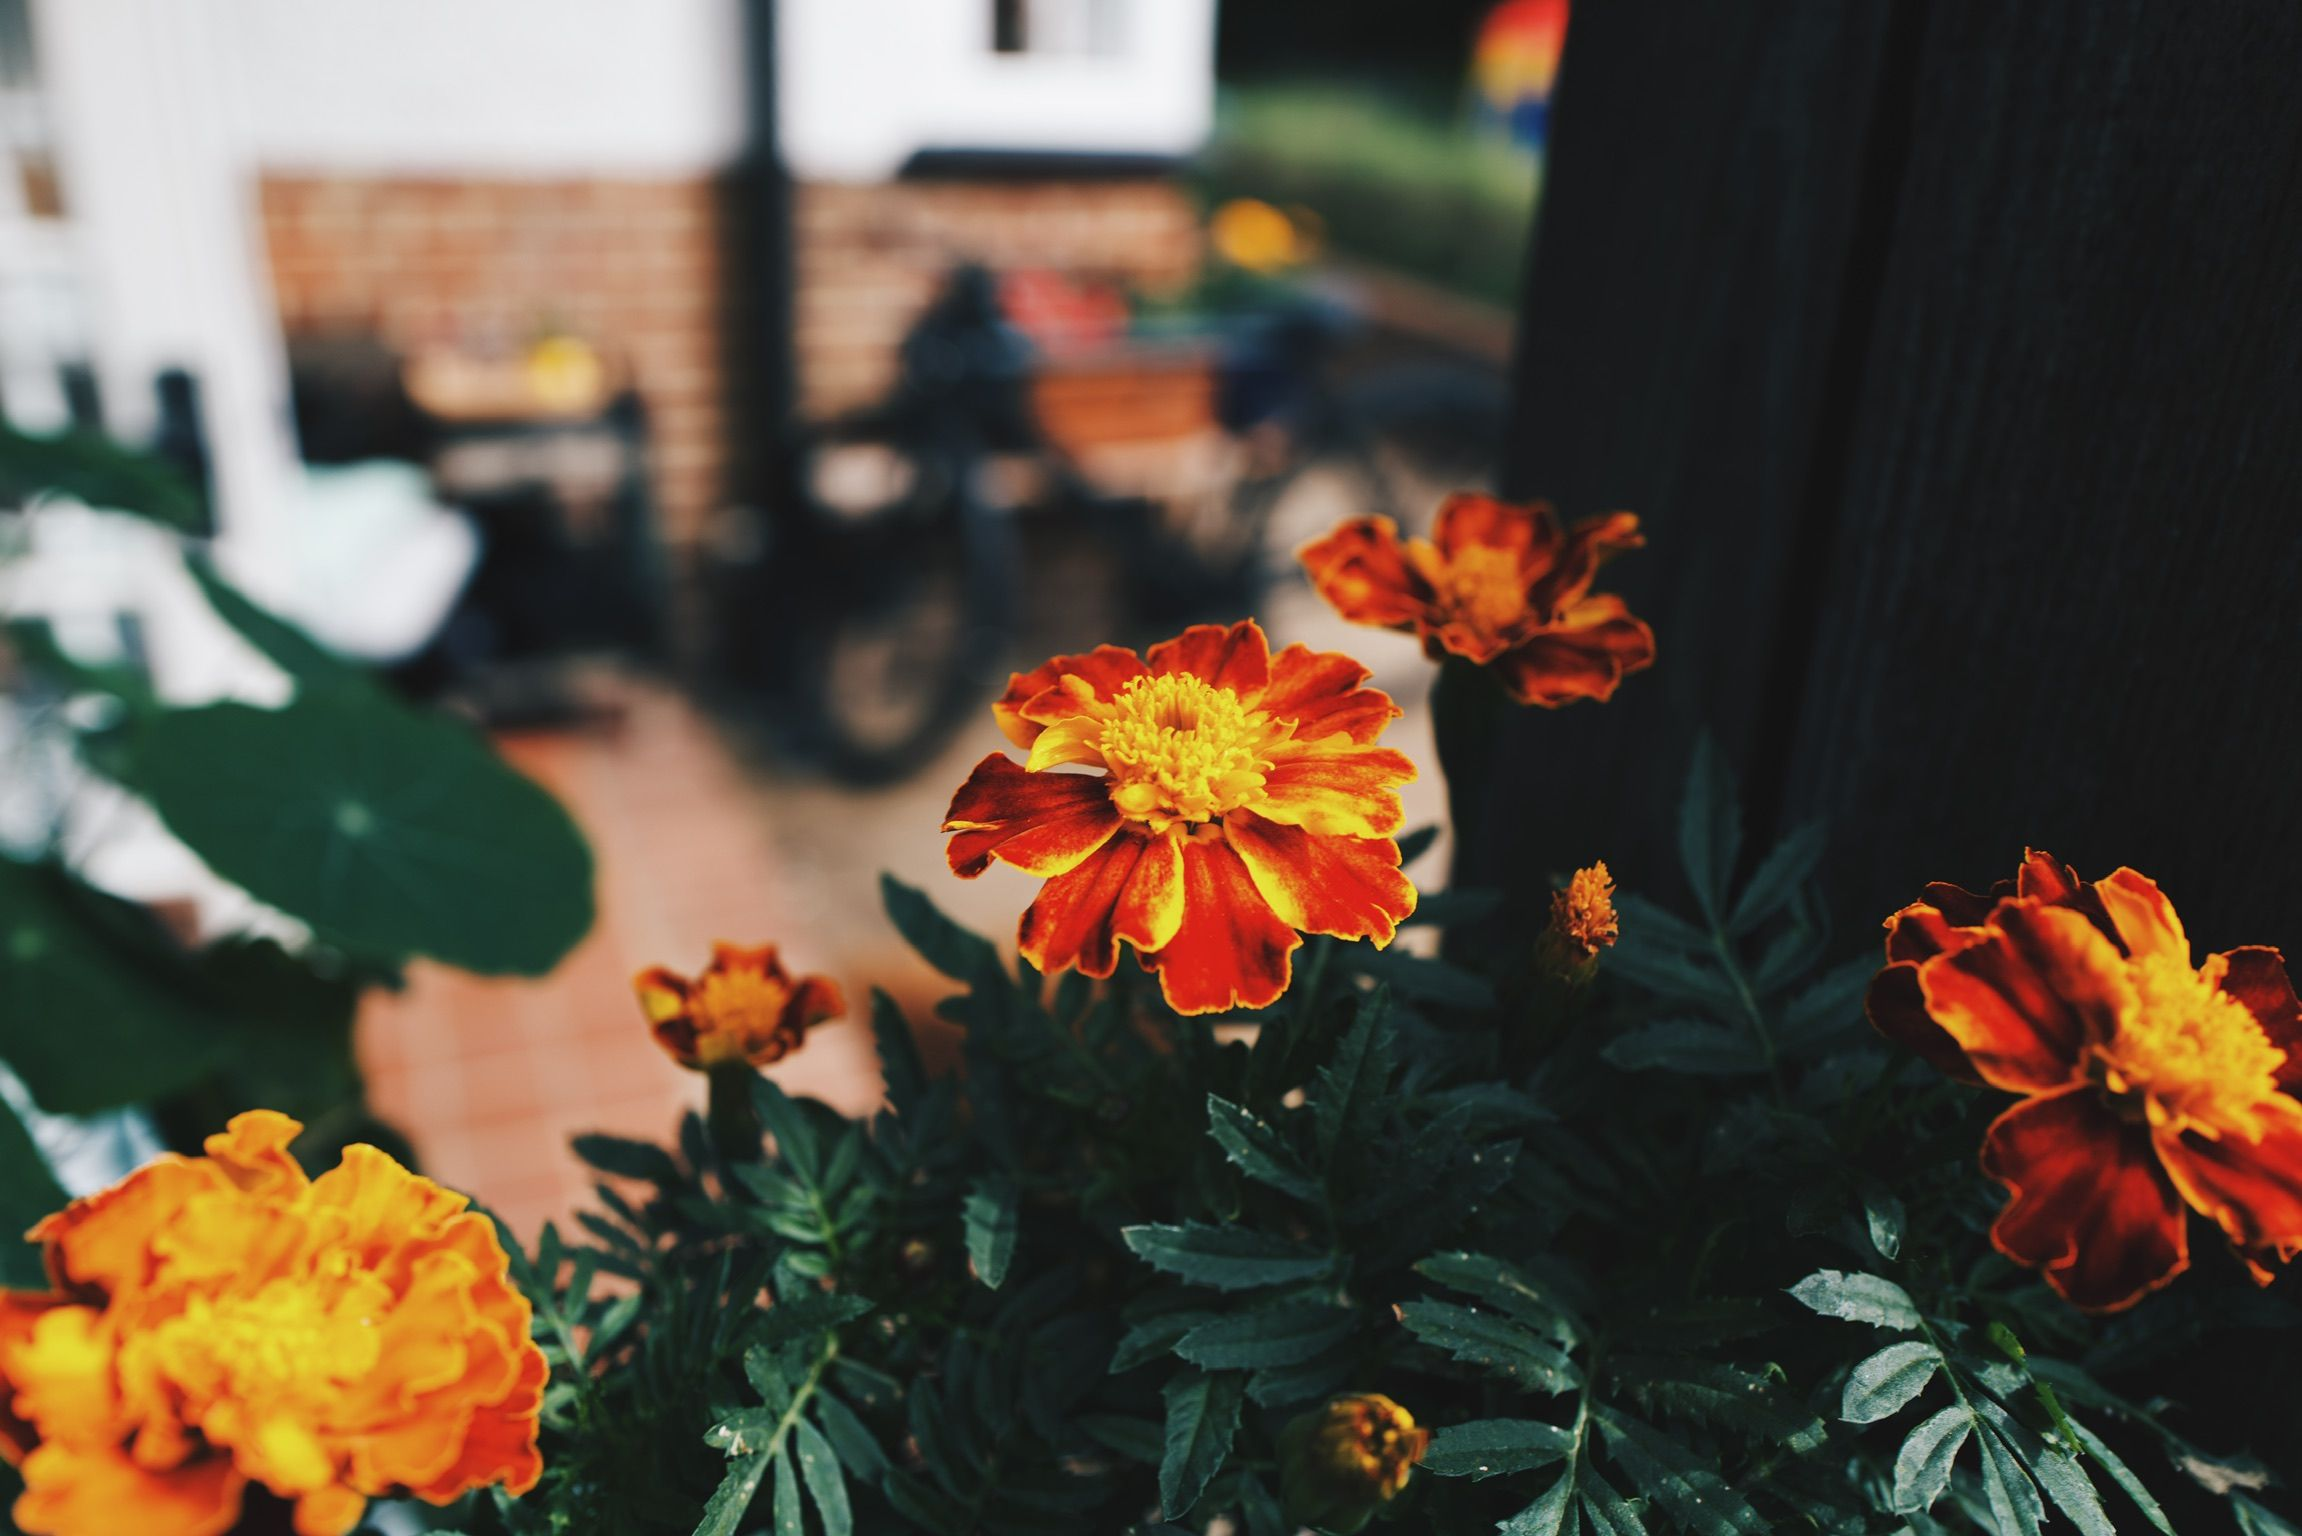 saturday in the garden 4